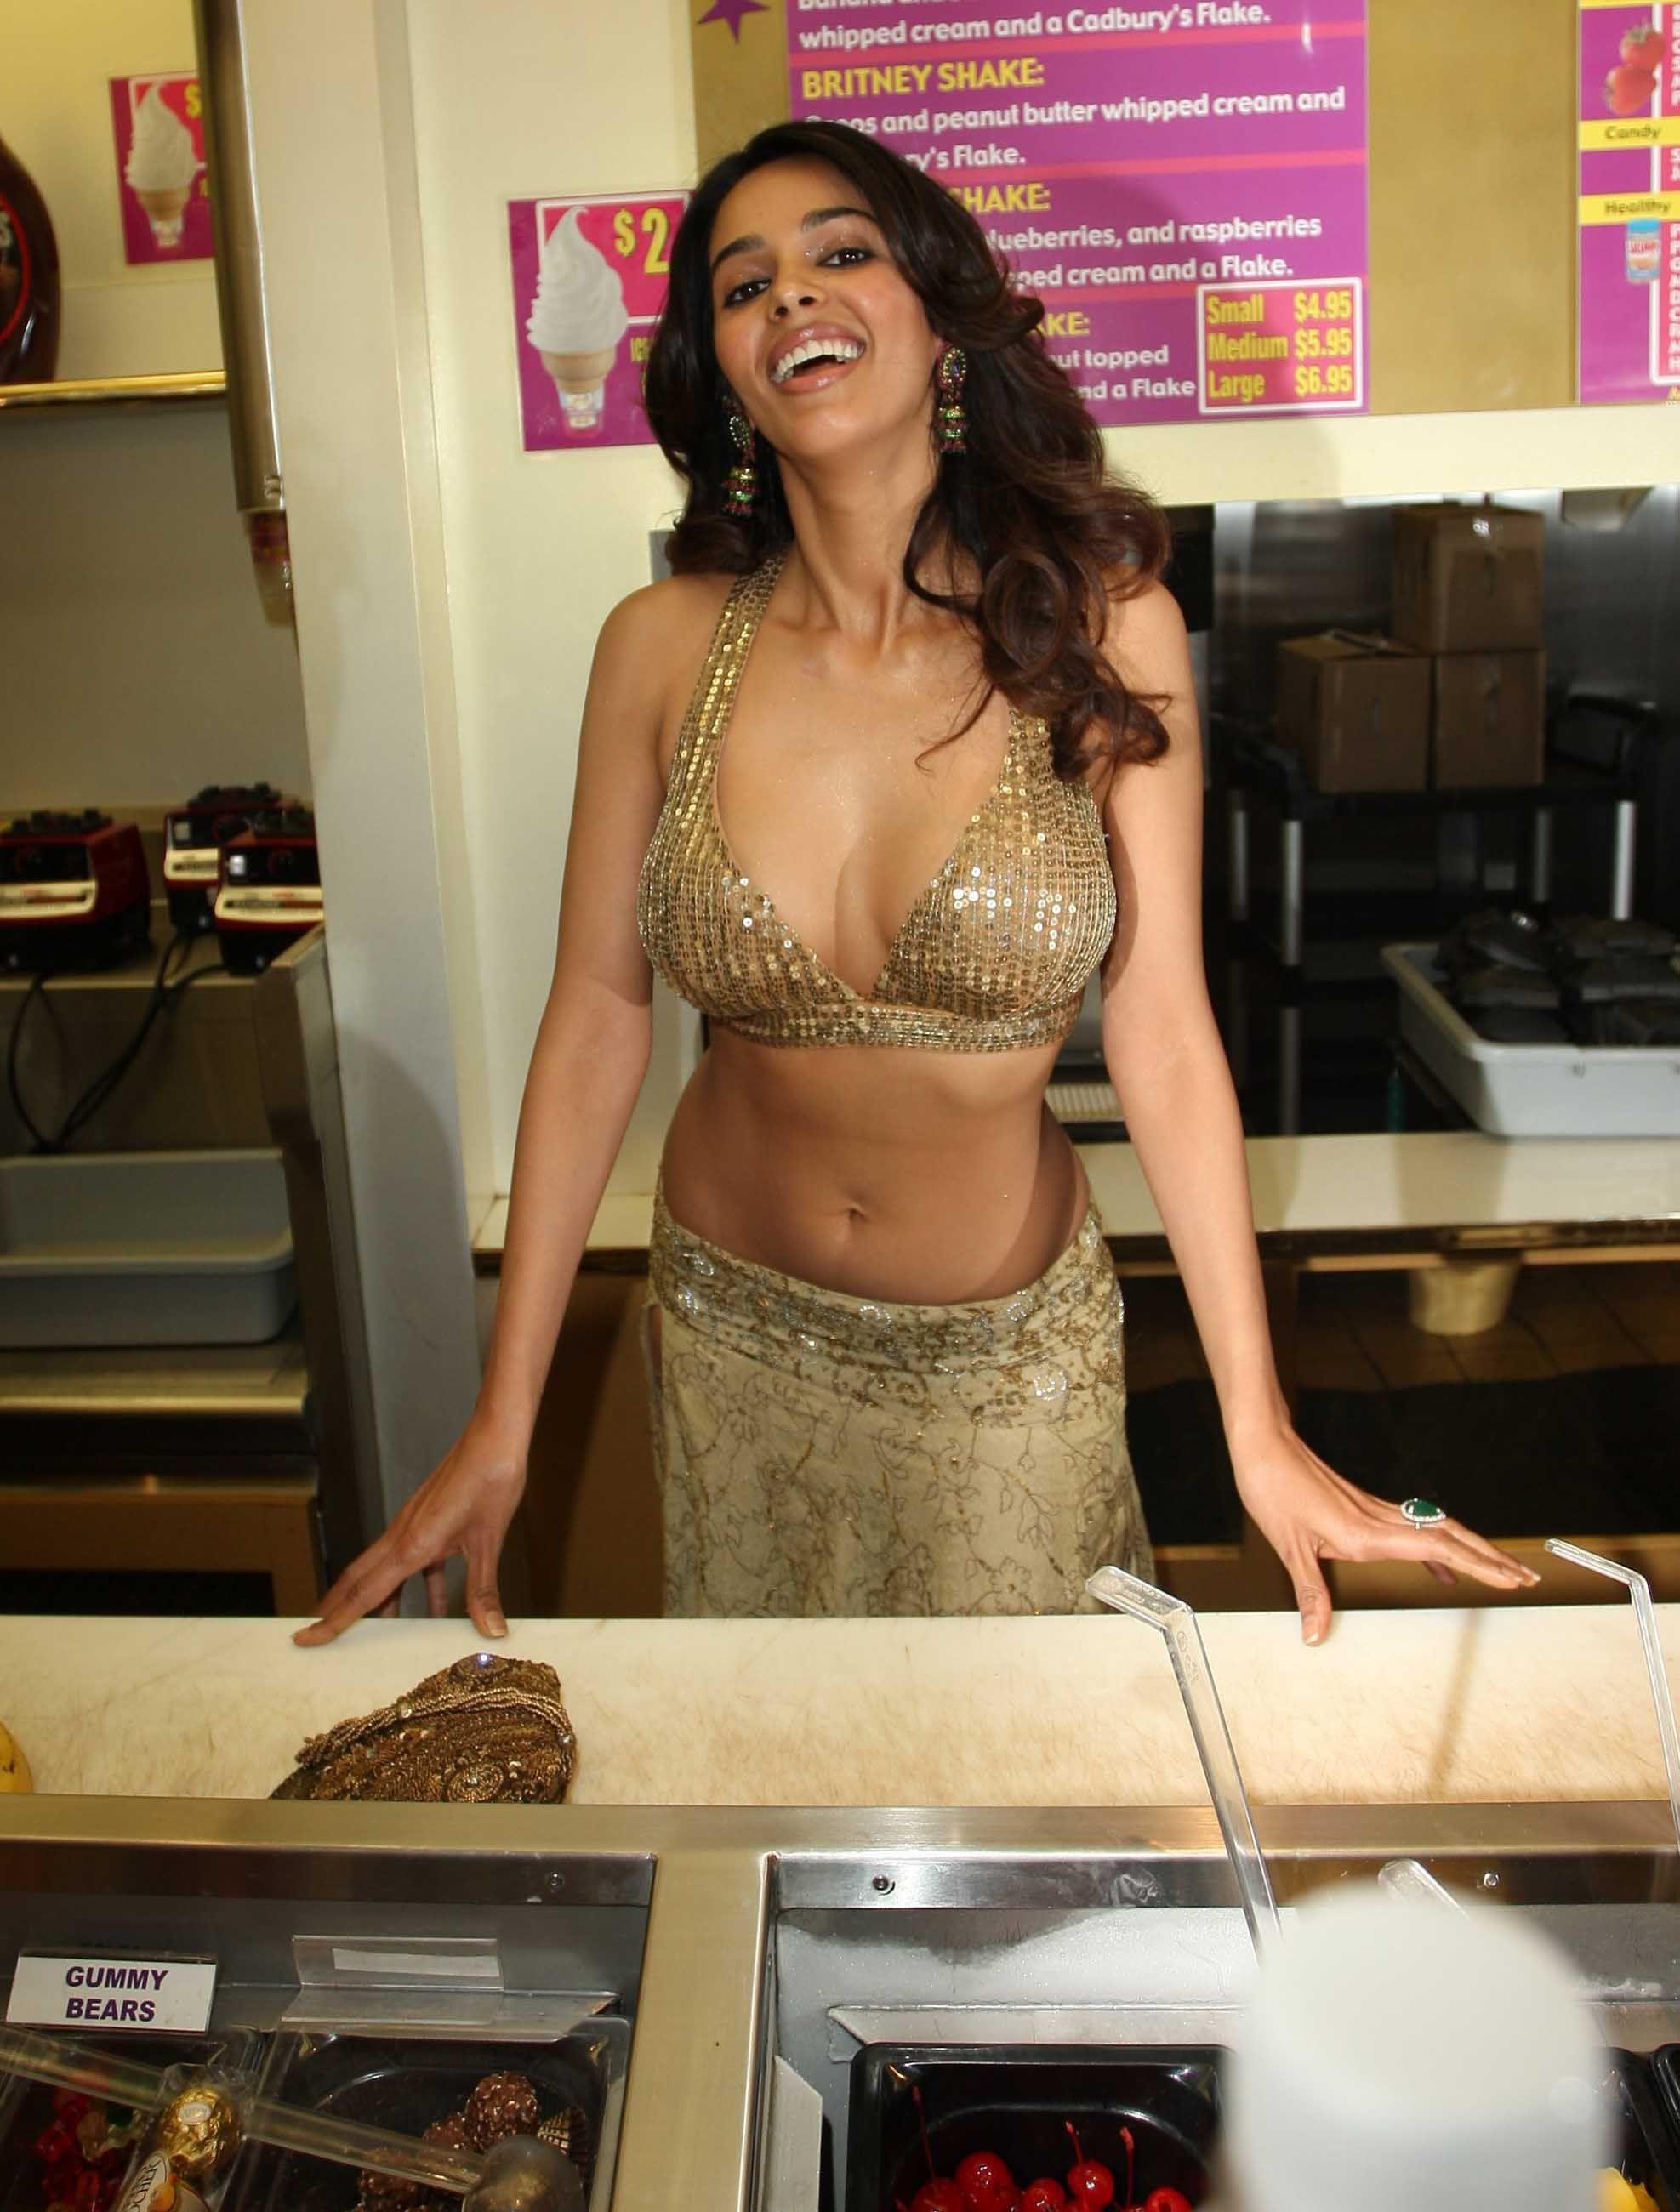 mallika sherawat milkshake | mallika sherawat | pinterest | milkshake